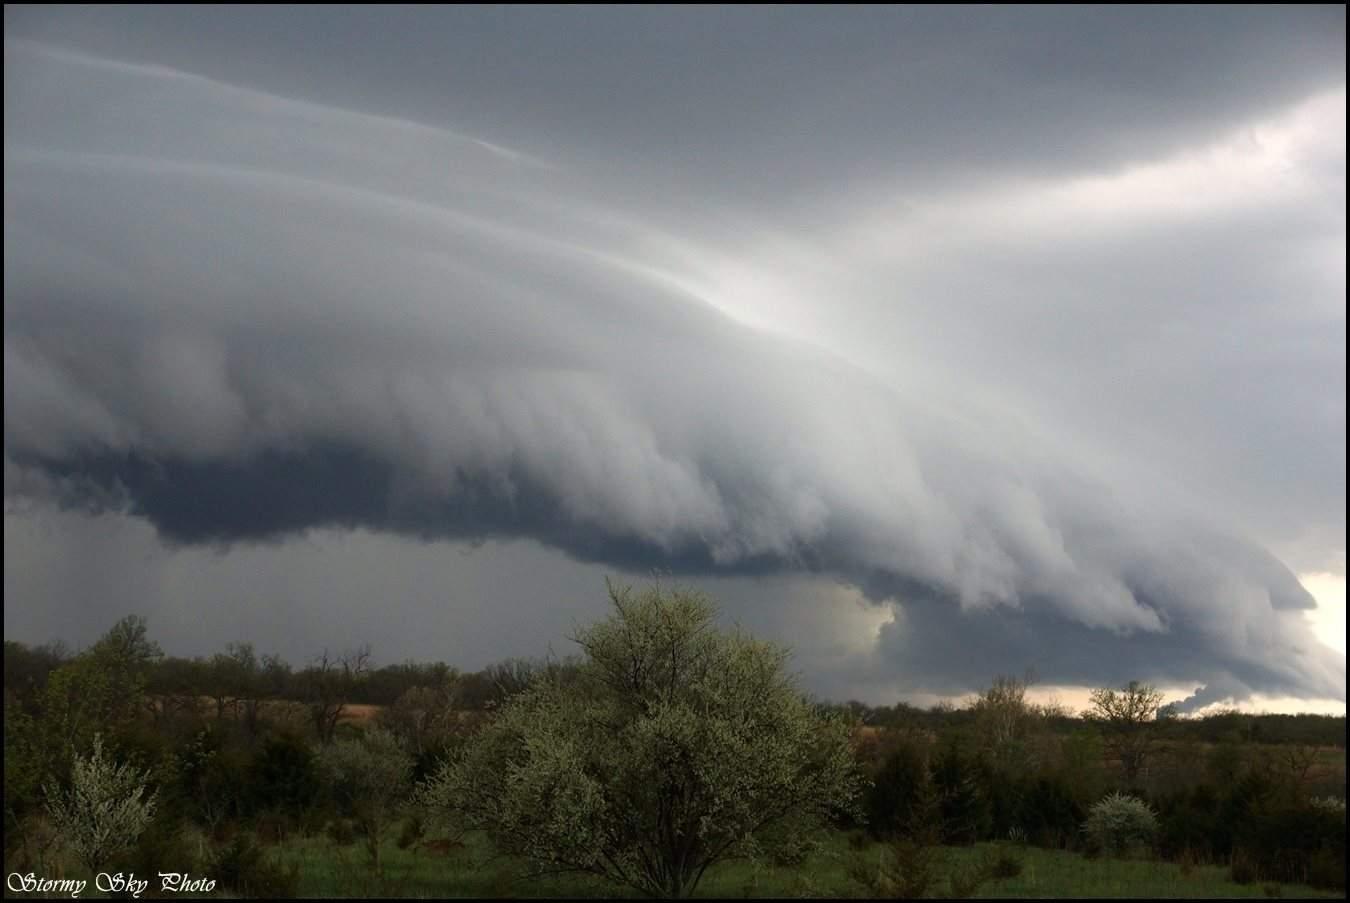 Inbound! Wicked shelf cloud coming through.